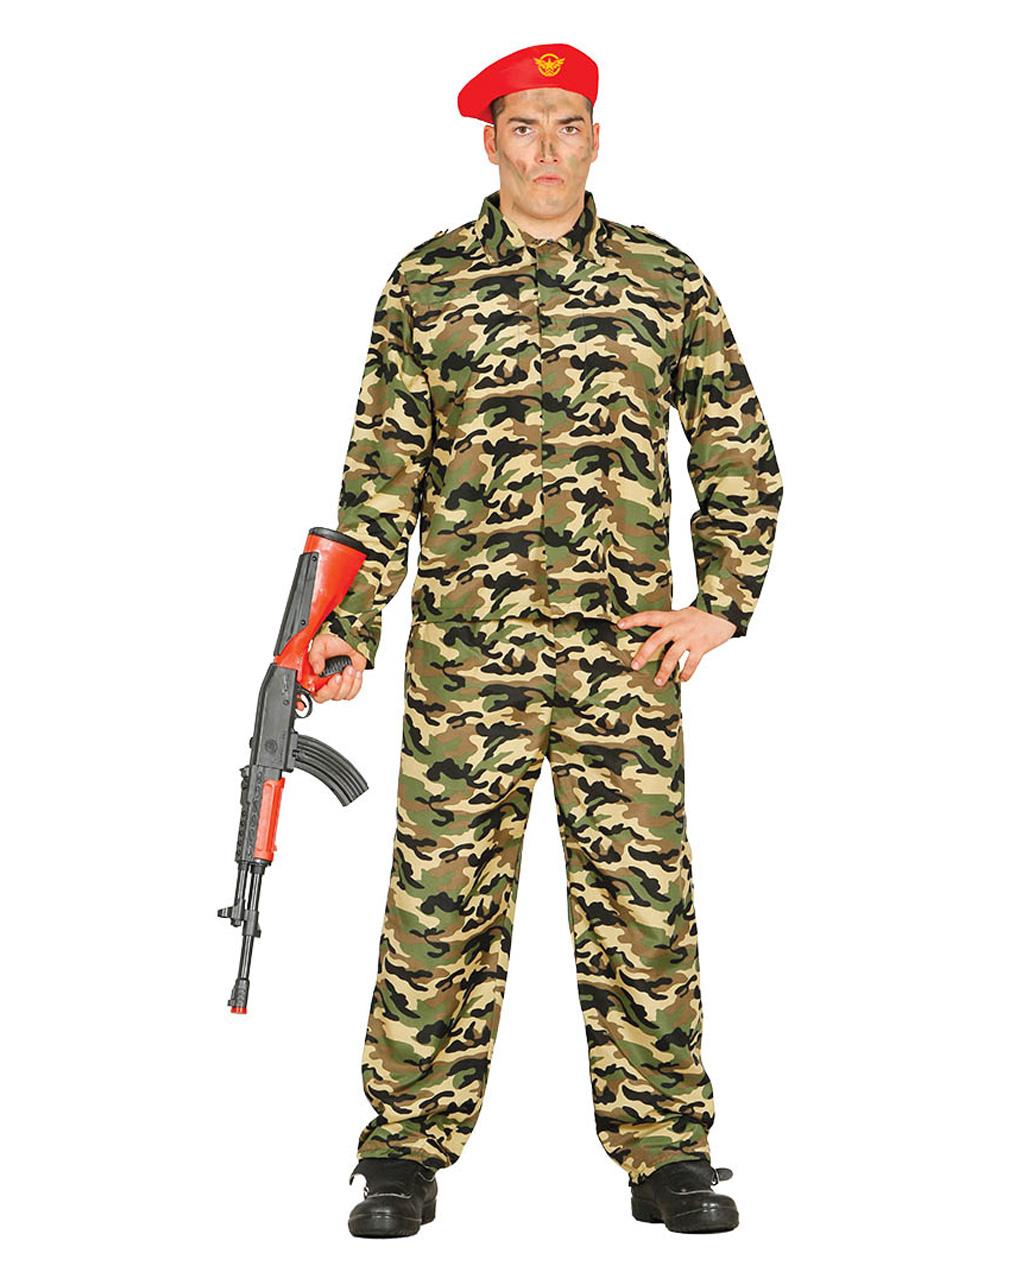 camouflage kost m soldat mit m tze kaufen karneval universe. Black Bedroom Furniture Sets. Home Design Ideas